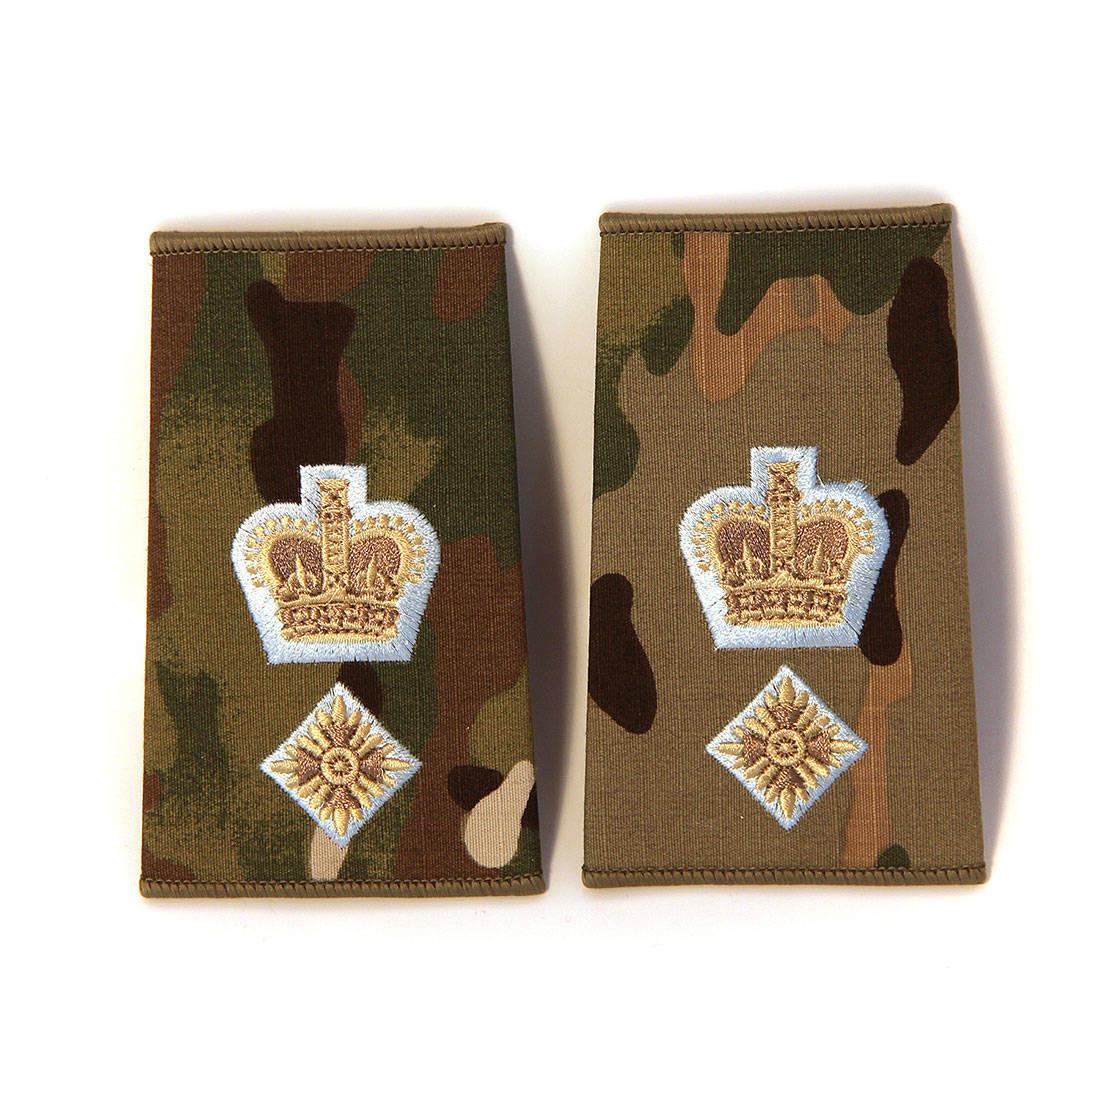 Officer Rank Slide Pairs (Parachute Regiment)